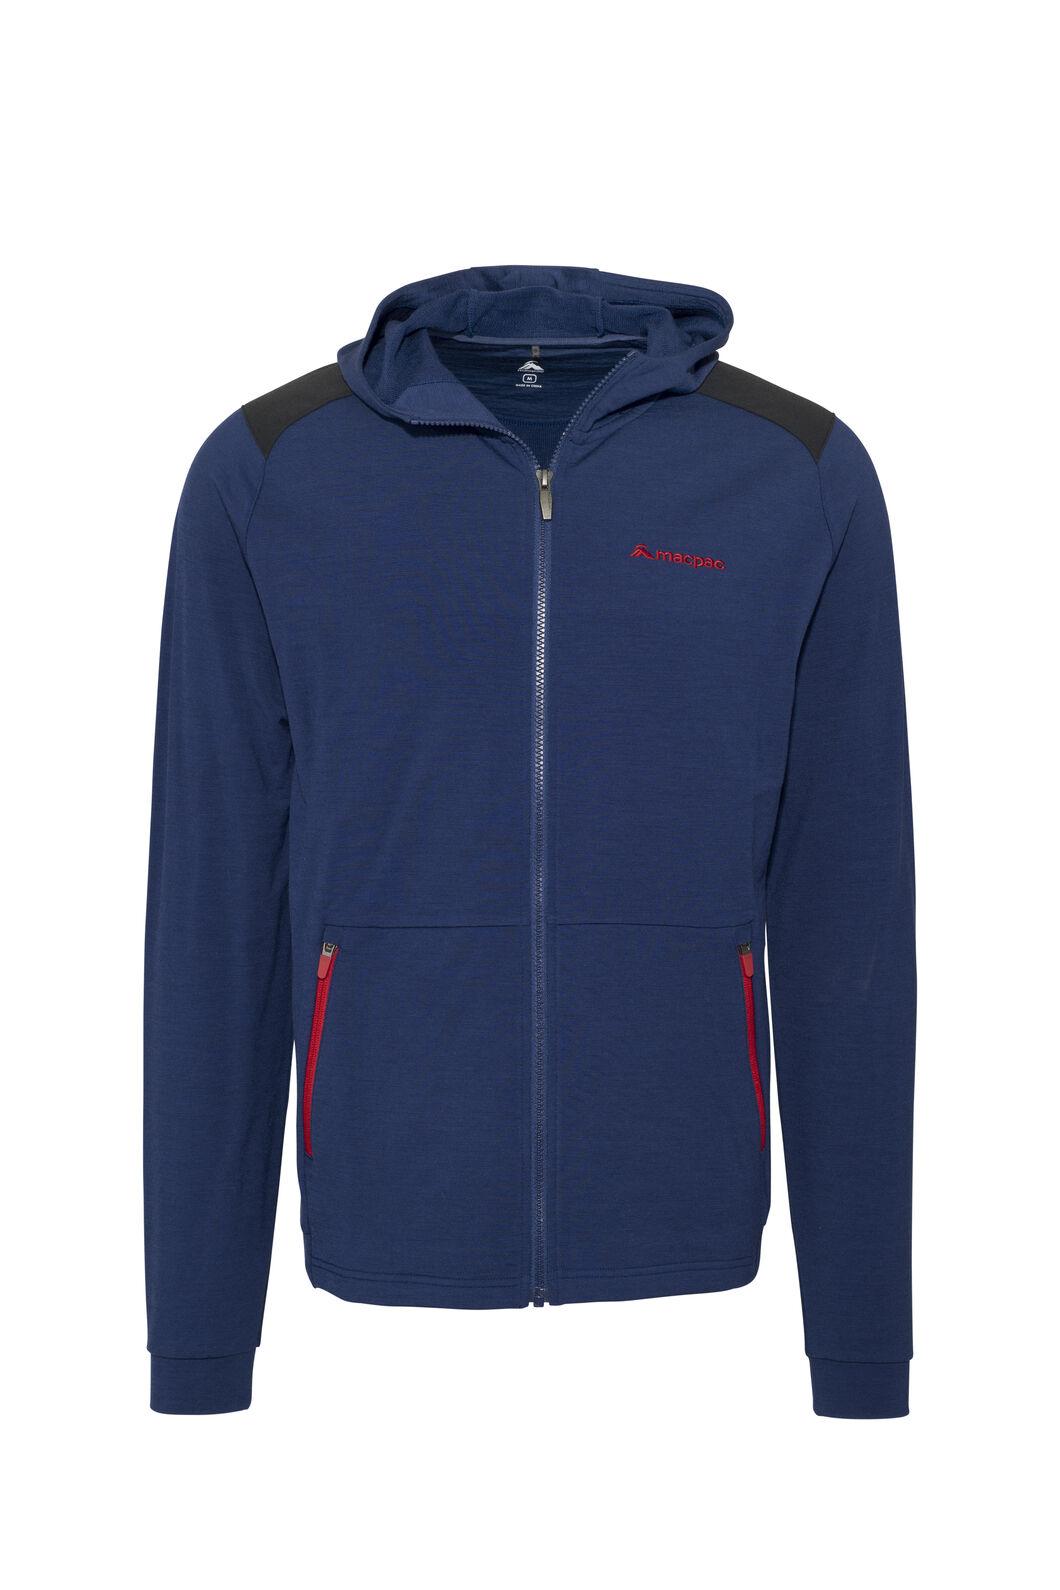 Macpac Strata 280 Merino Hooded Jacket — Men's, Blueprint, hi-res